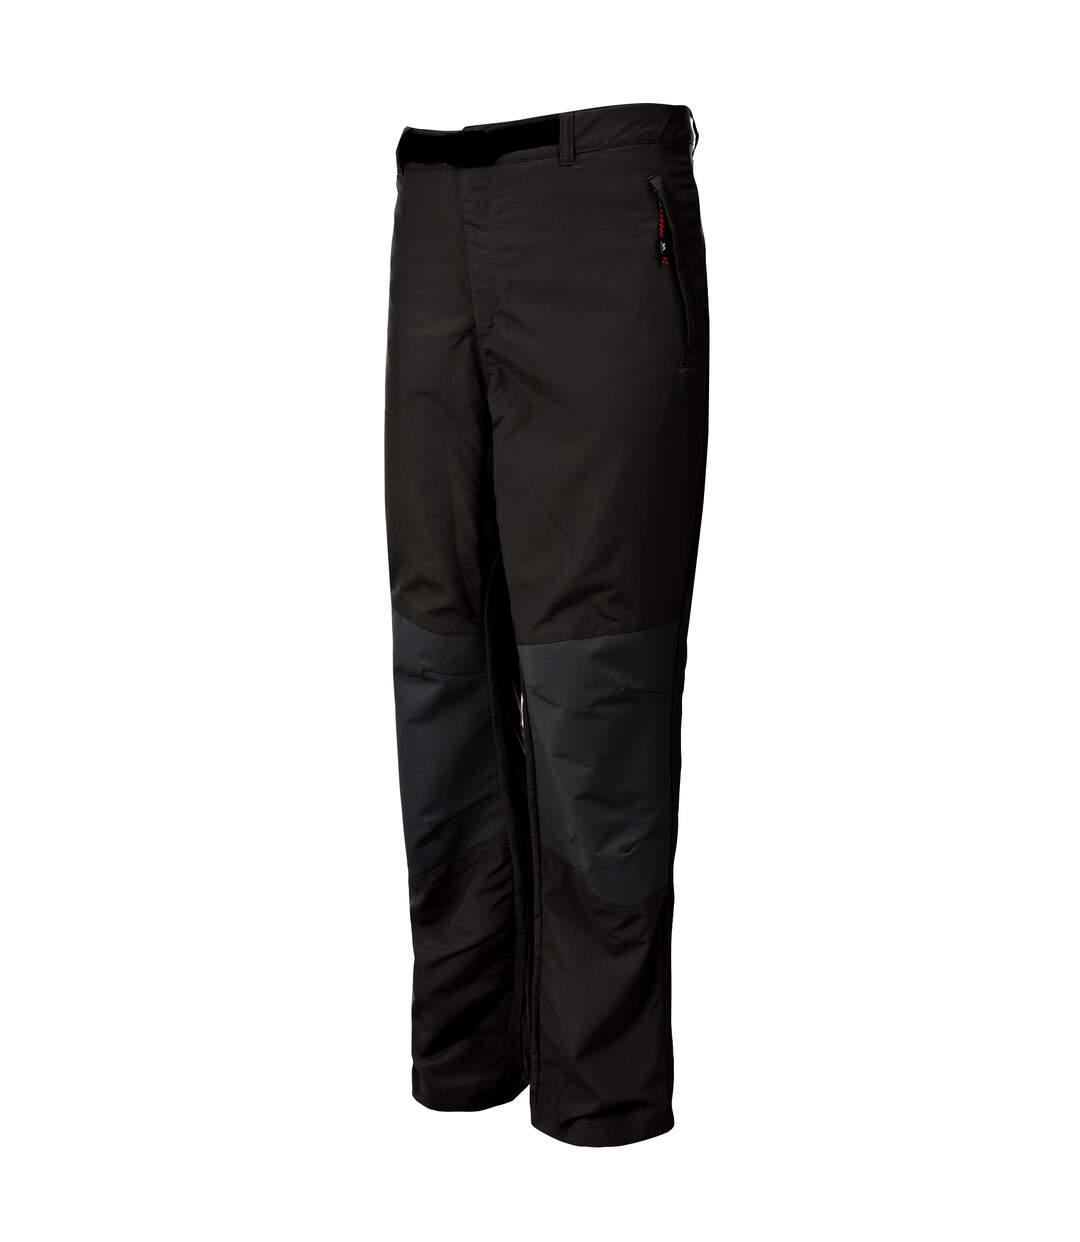 Trespass Mens Rawlins Adventure Trousers (Black) - UTTP3282